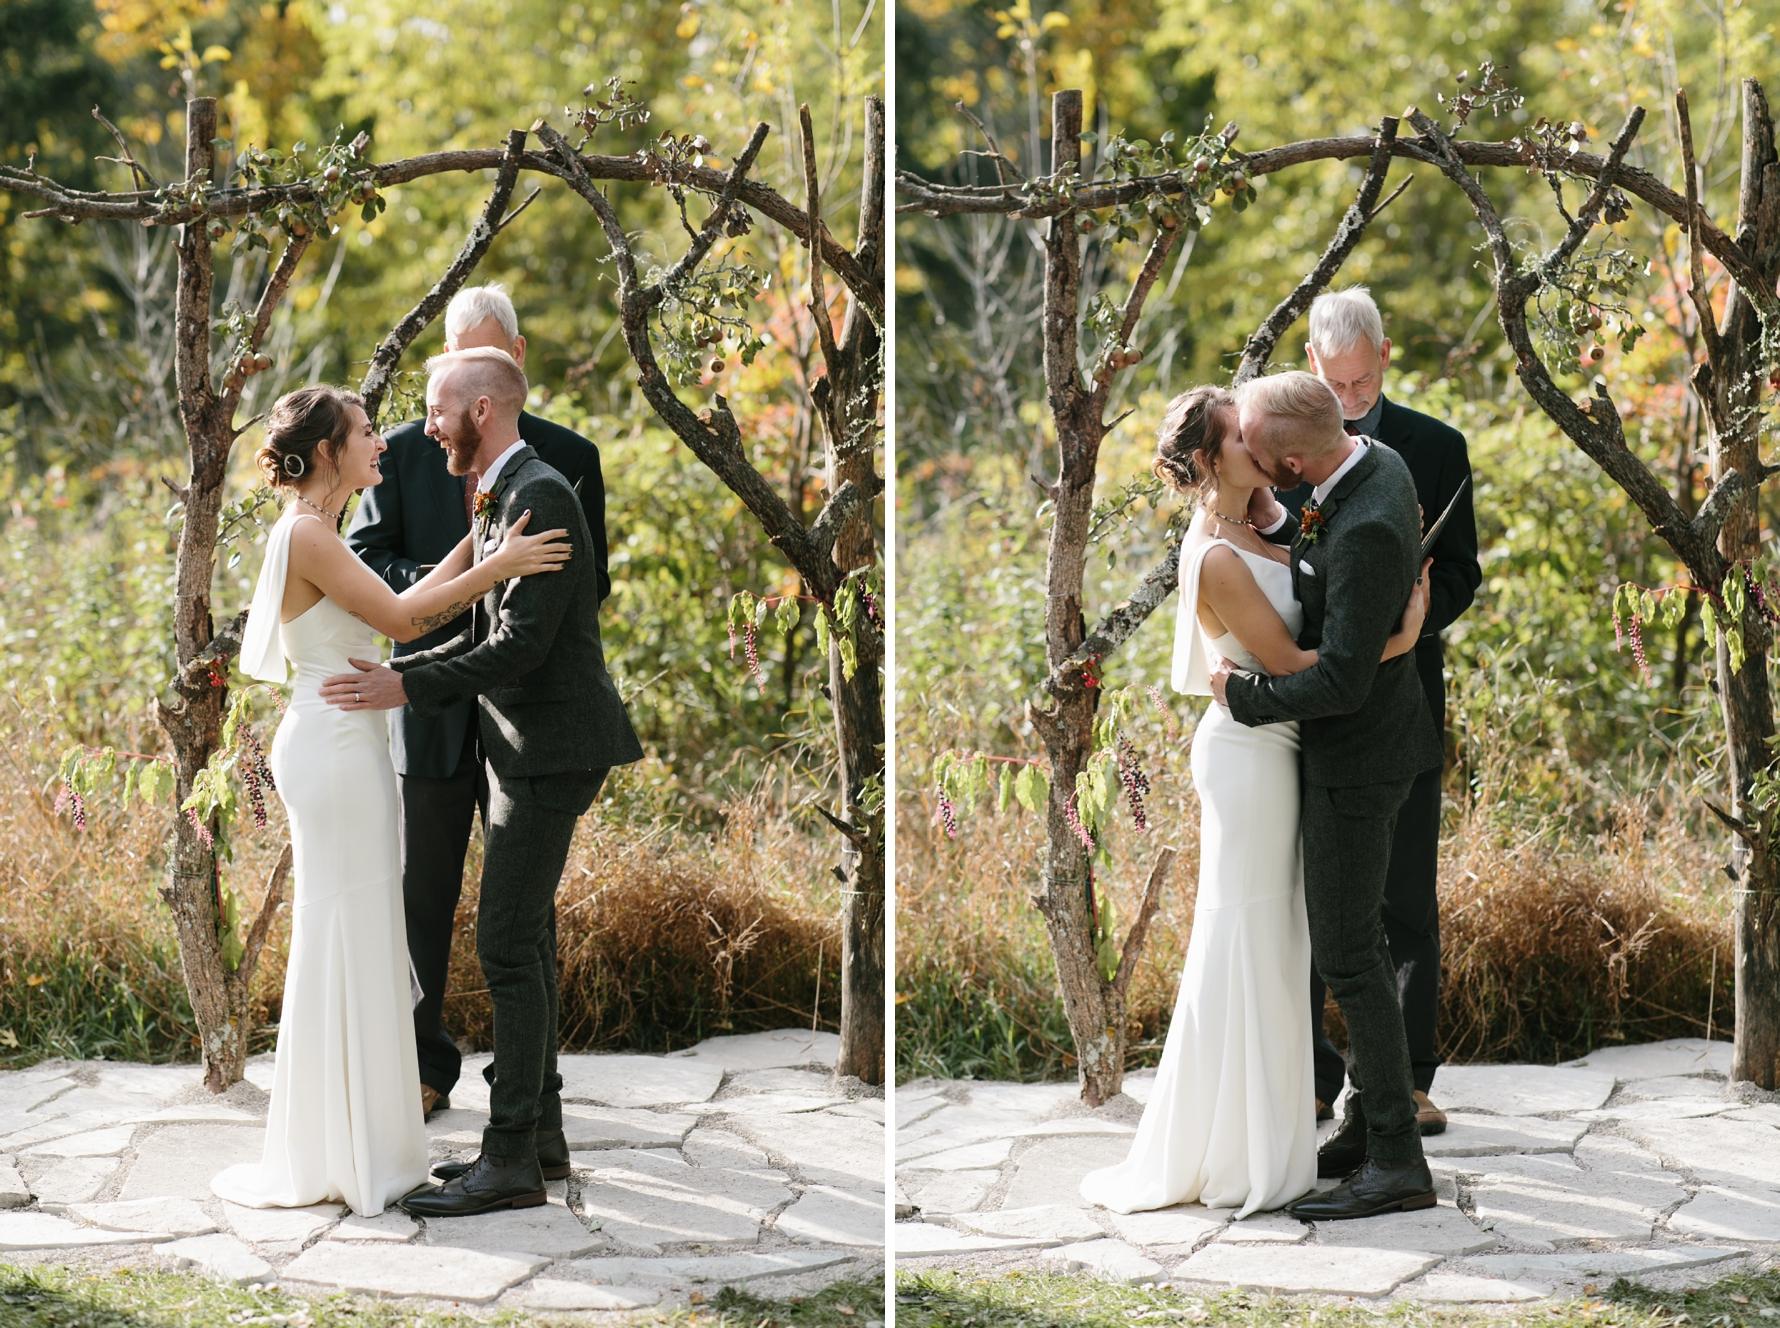 norris-traverse-city-wedding-47.JPG